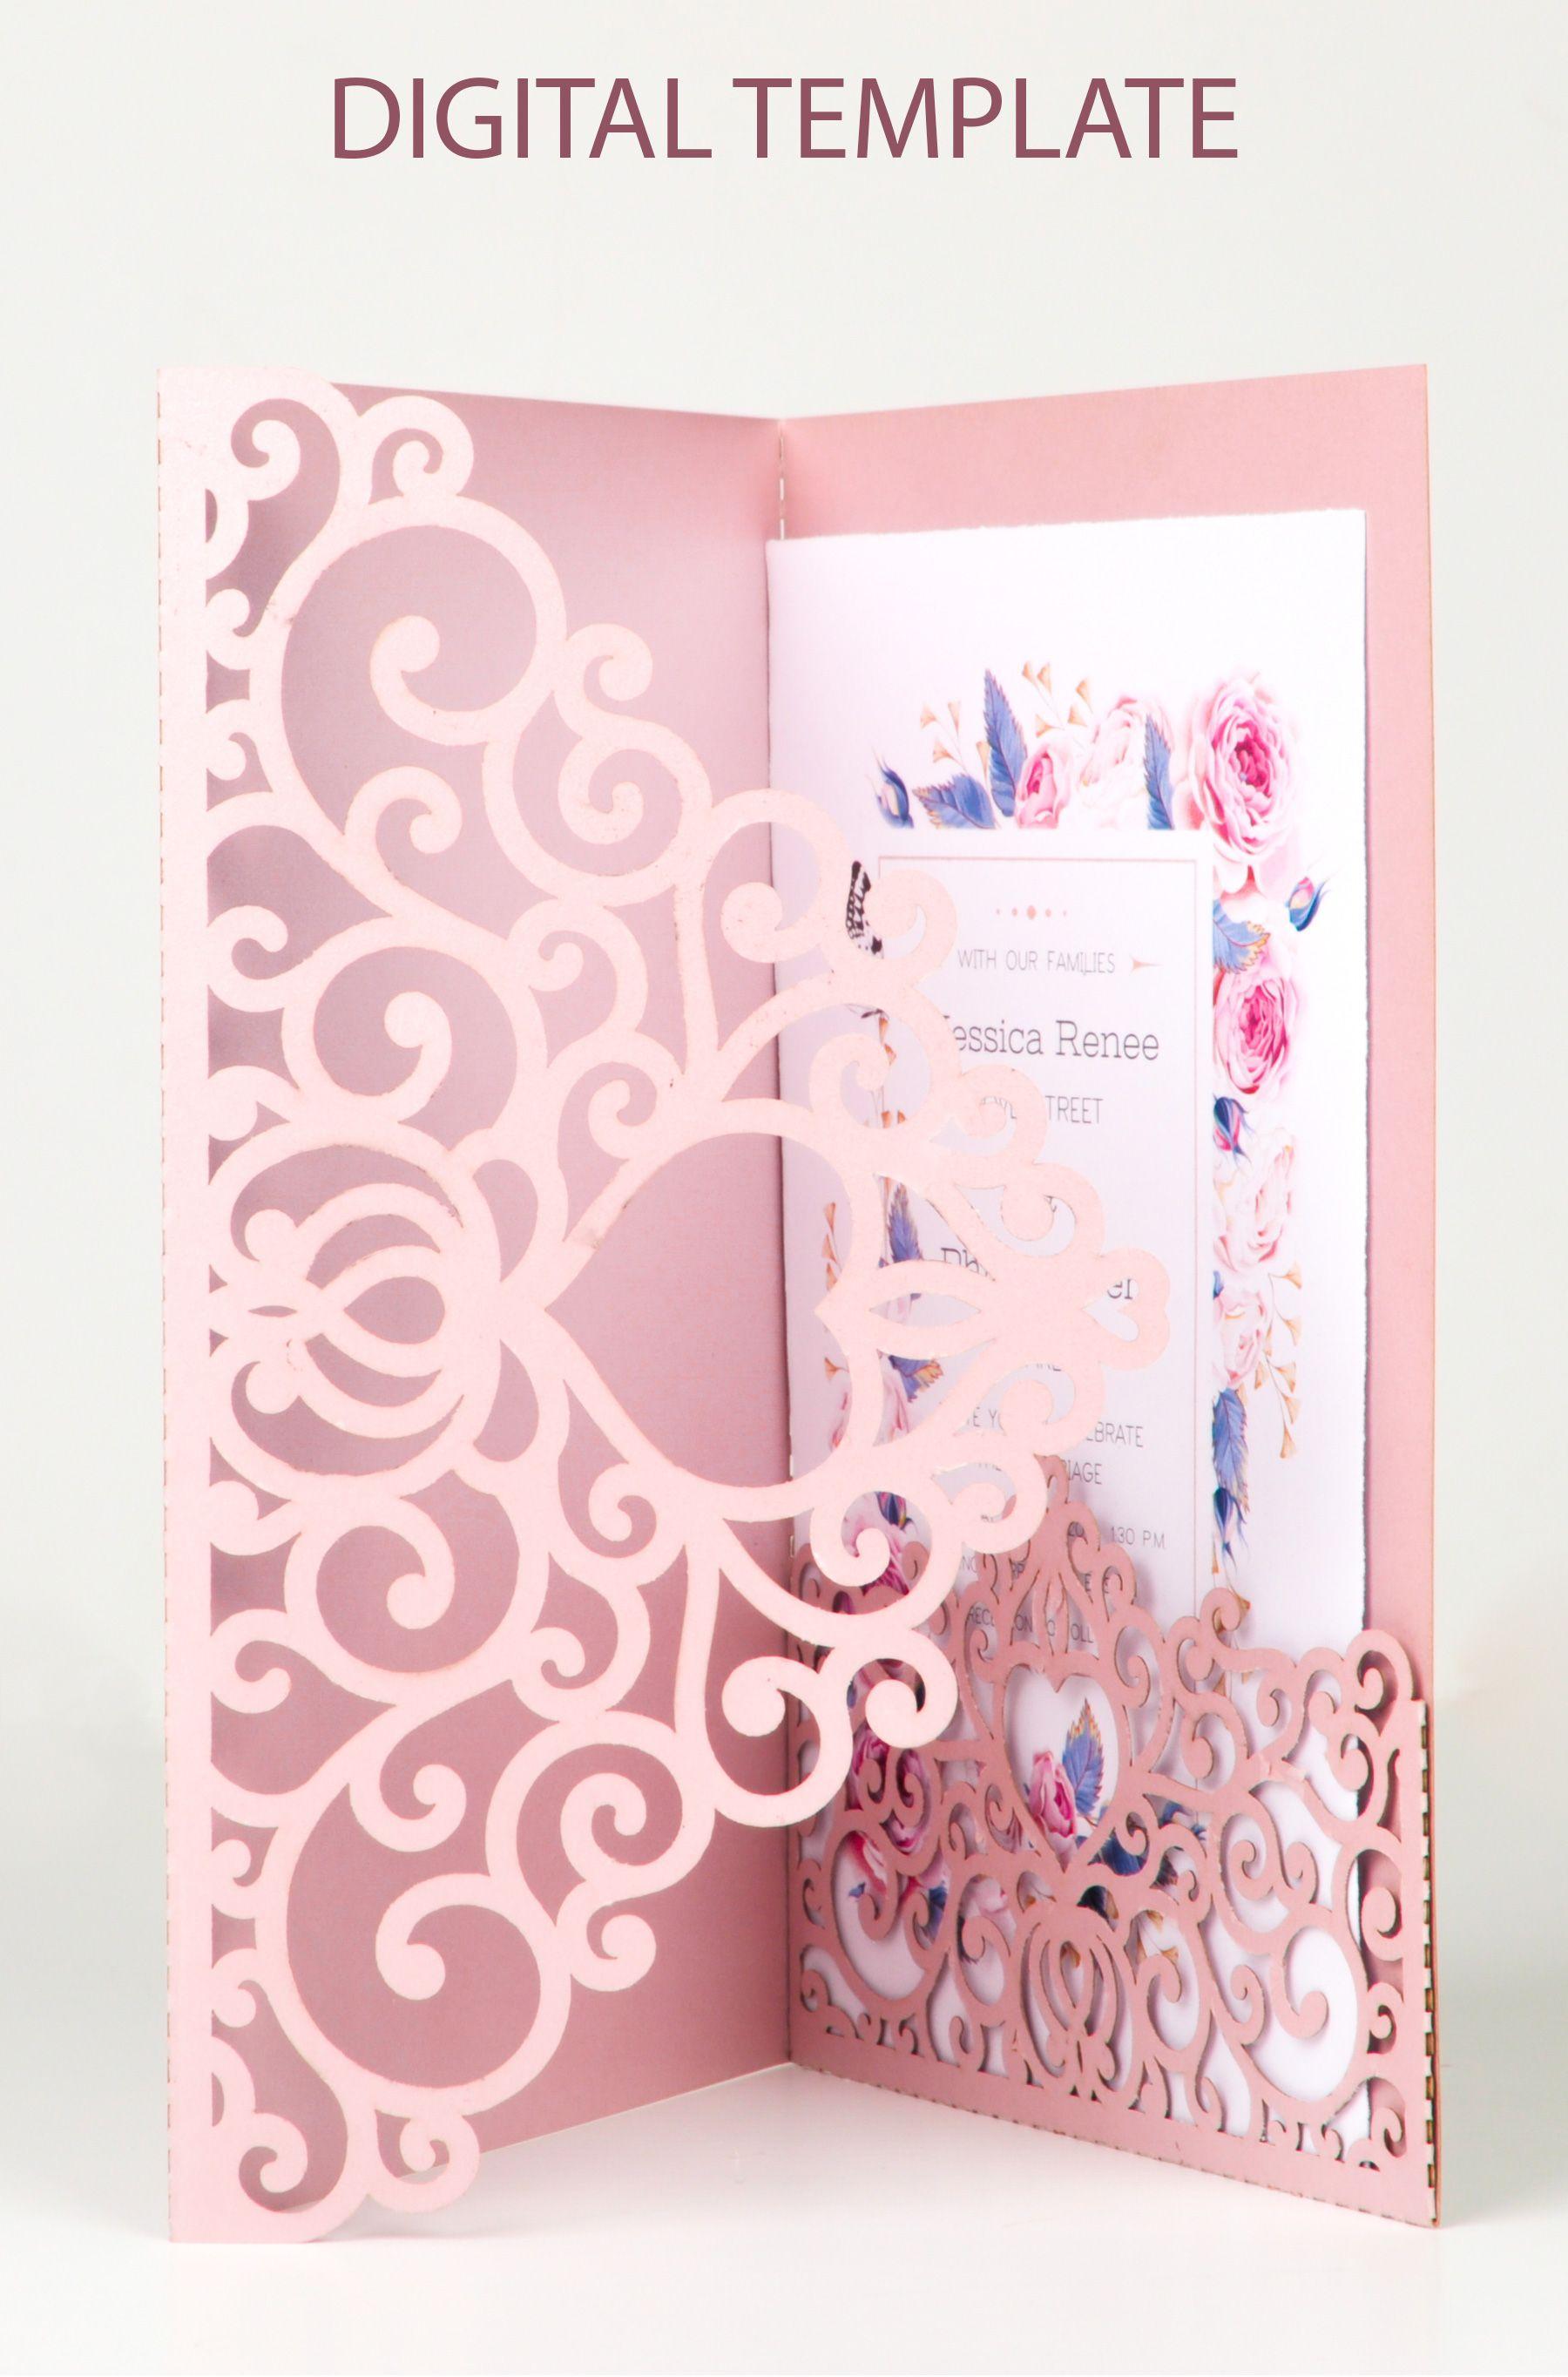 Wedding Envelope Invitation Template Ideas Design Cheap Budget Pocket Wedding Invitations Tri Fold Wedding Invitations Wedding Invitation Card Design